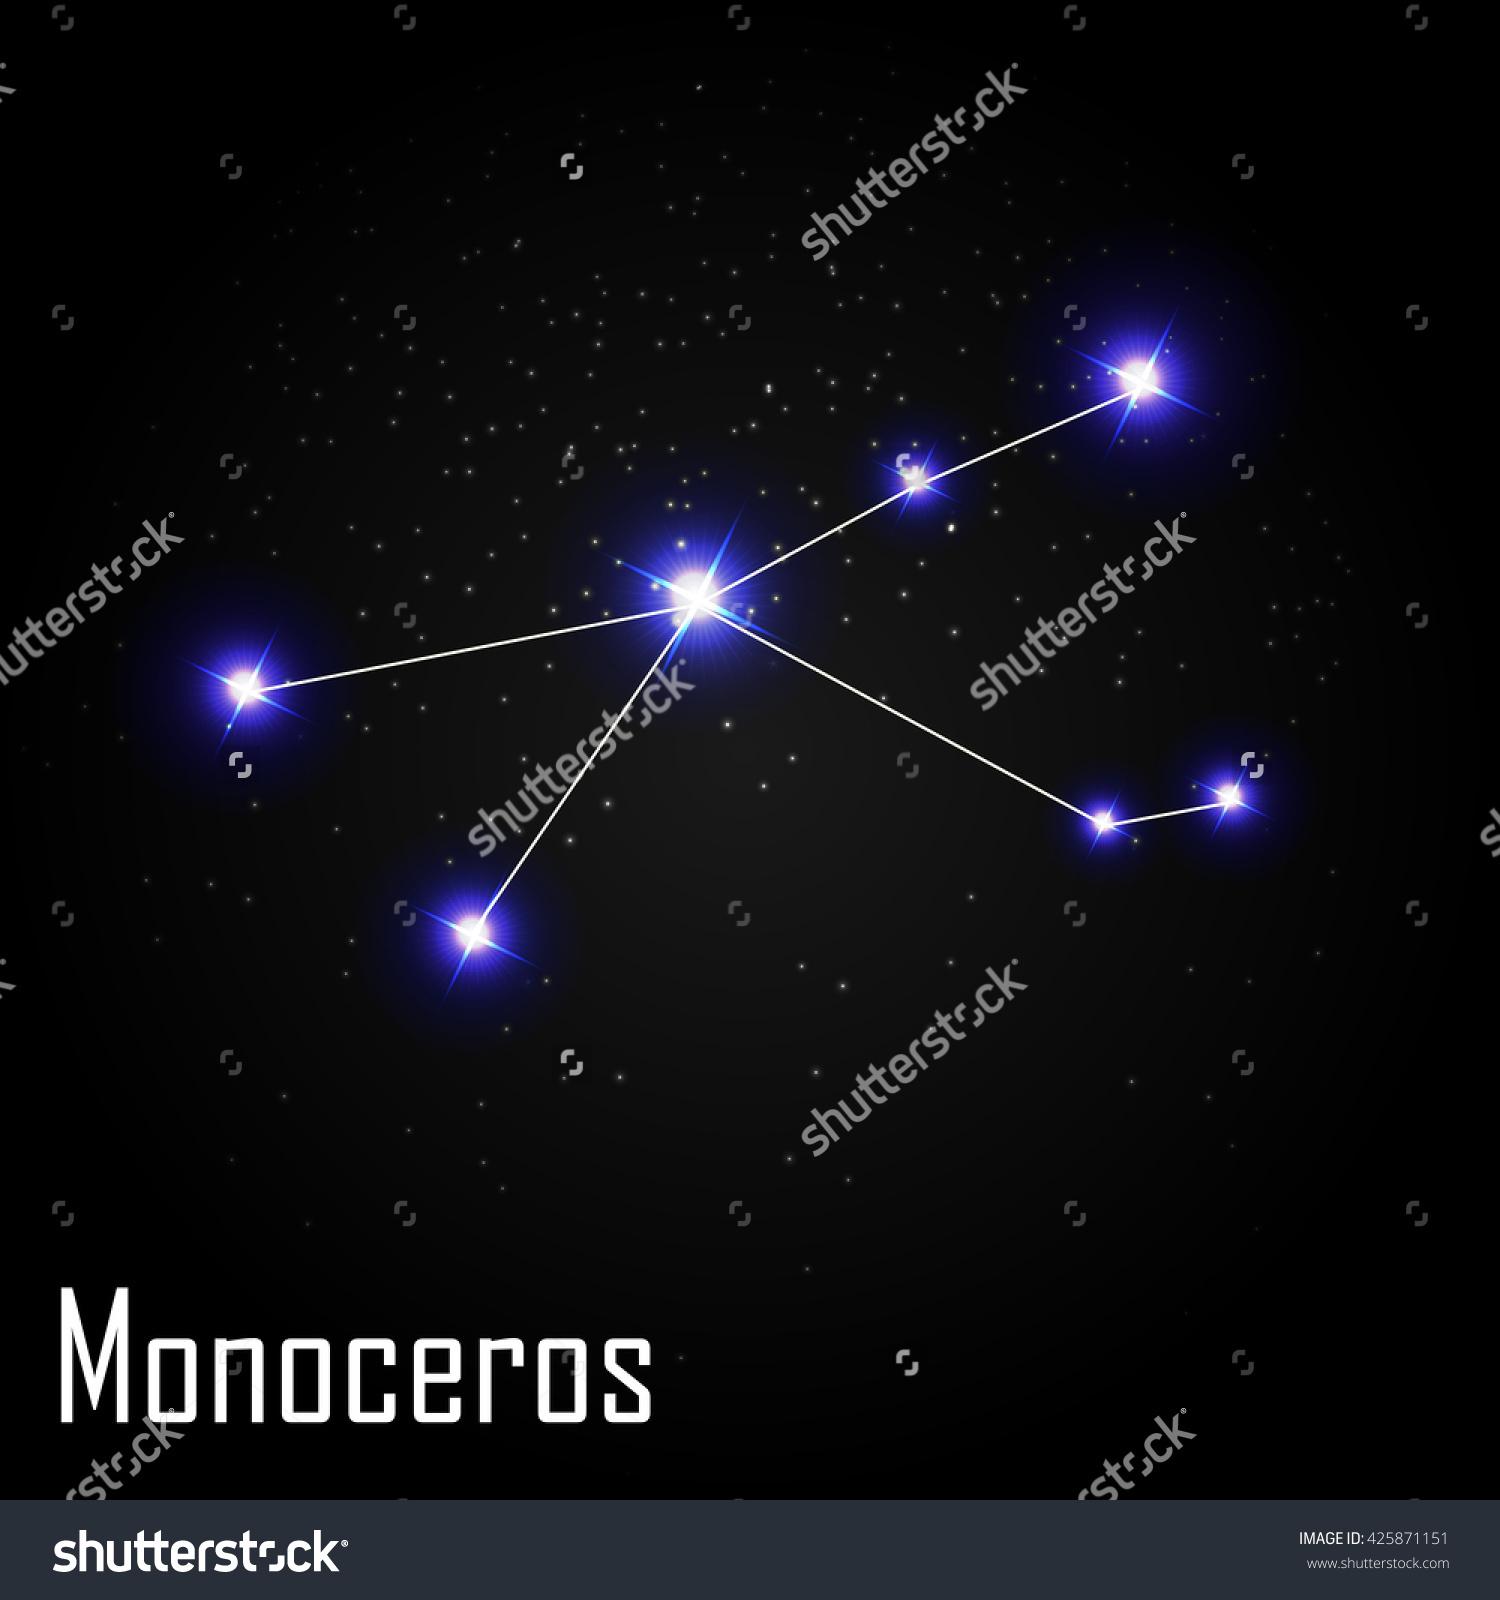 Monoceros Constellation Beautiful Bright Stars On Stock Vector.